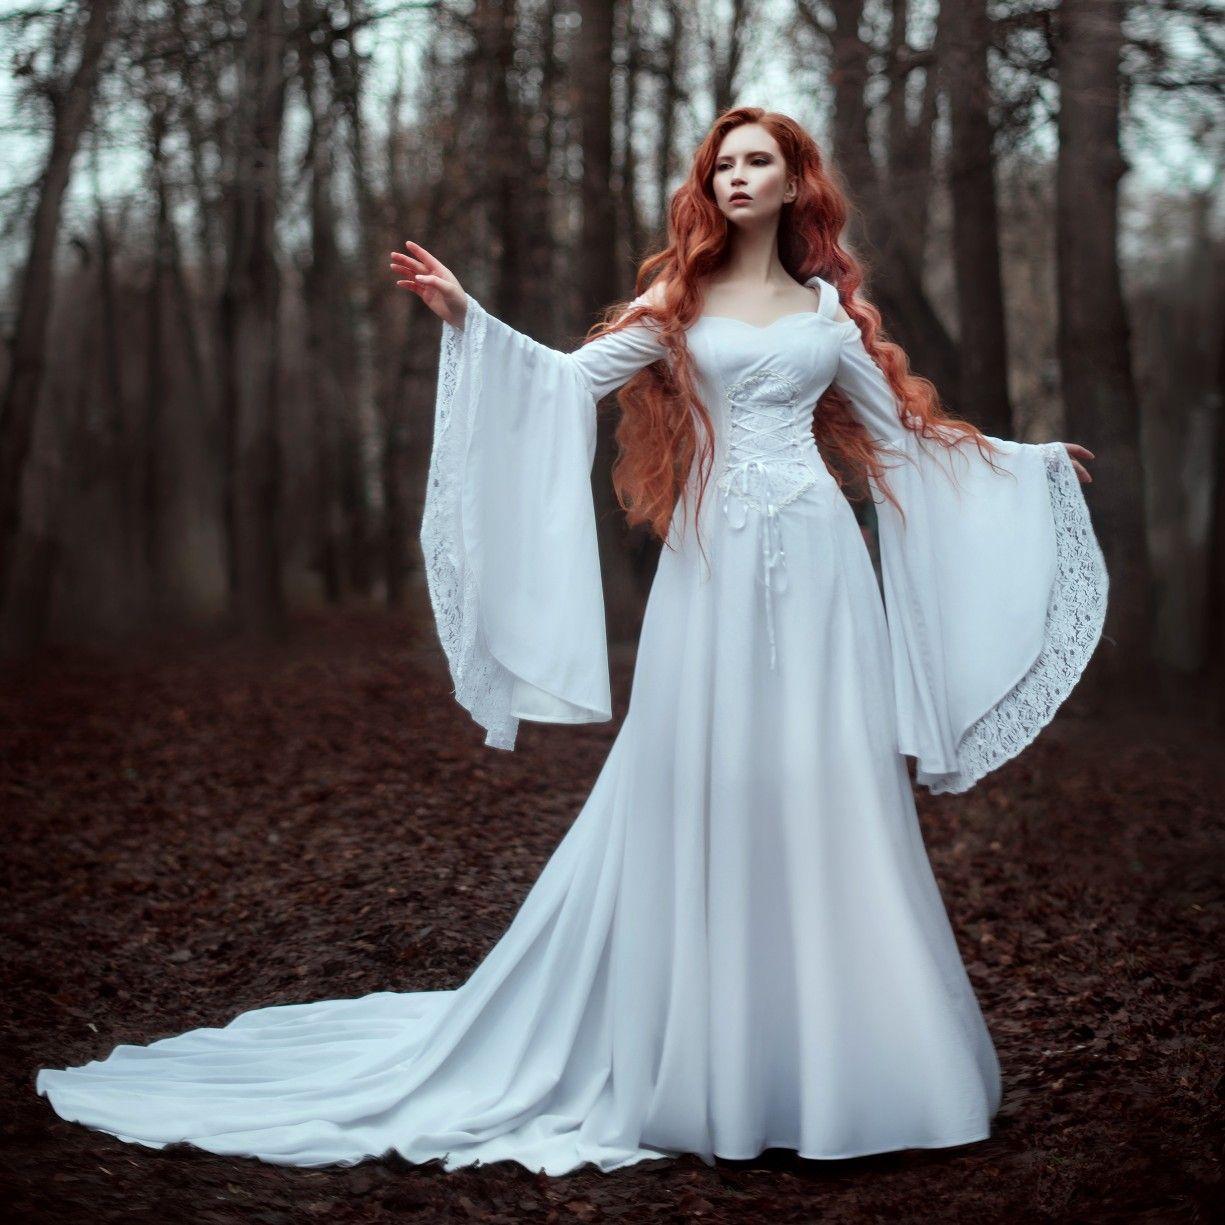 Medieval Fantasy Queen Medieval Wedding Dress / Medieval ...